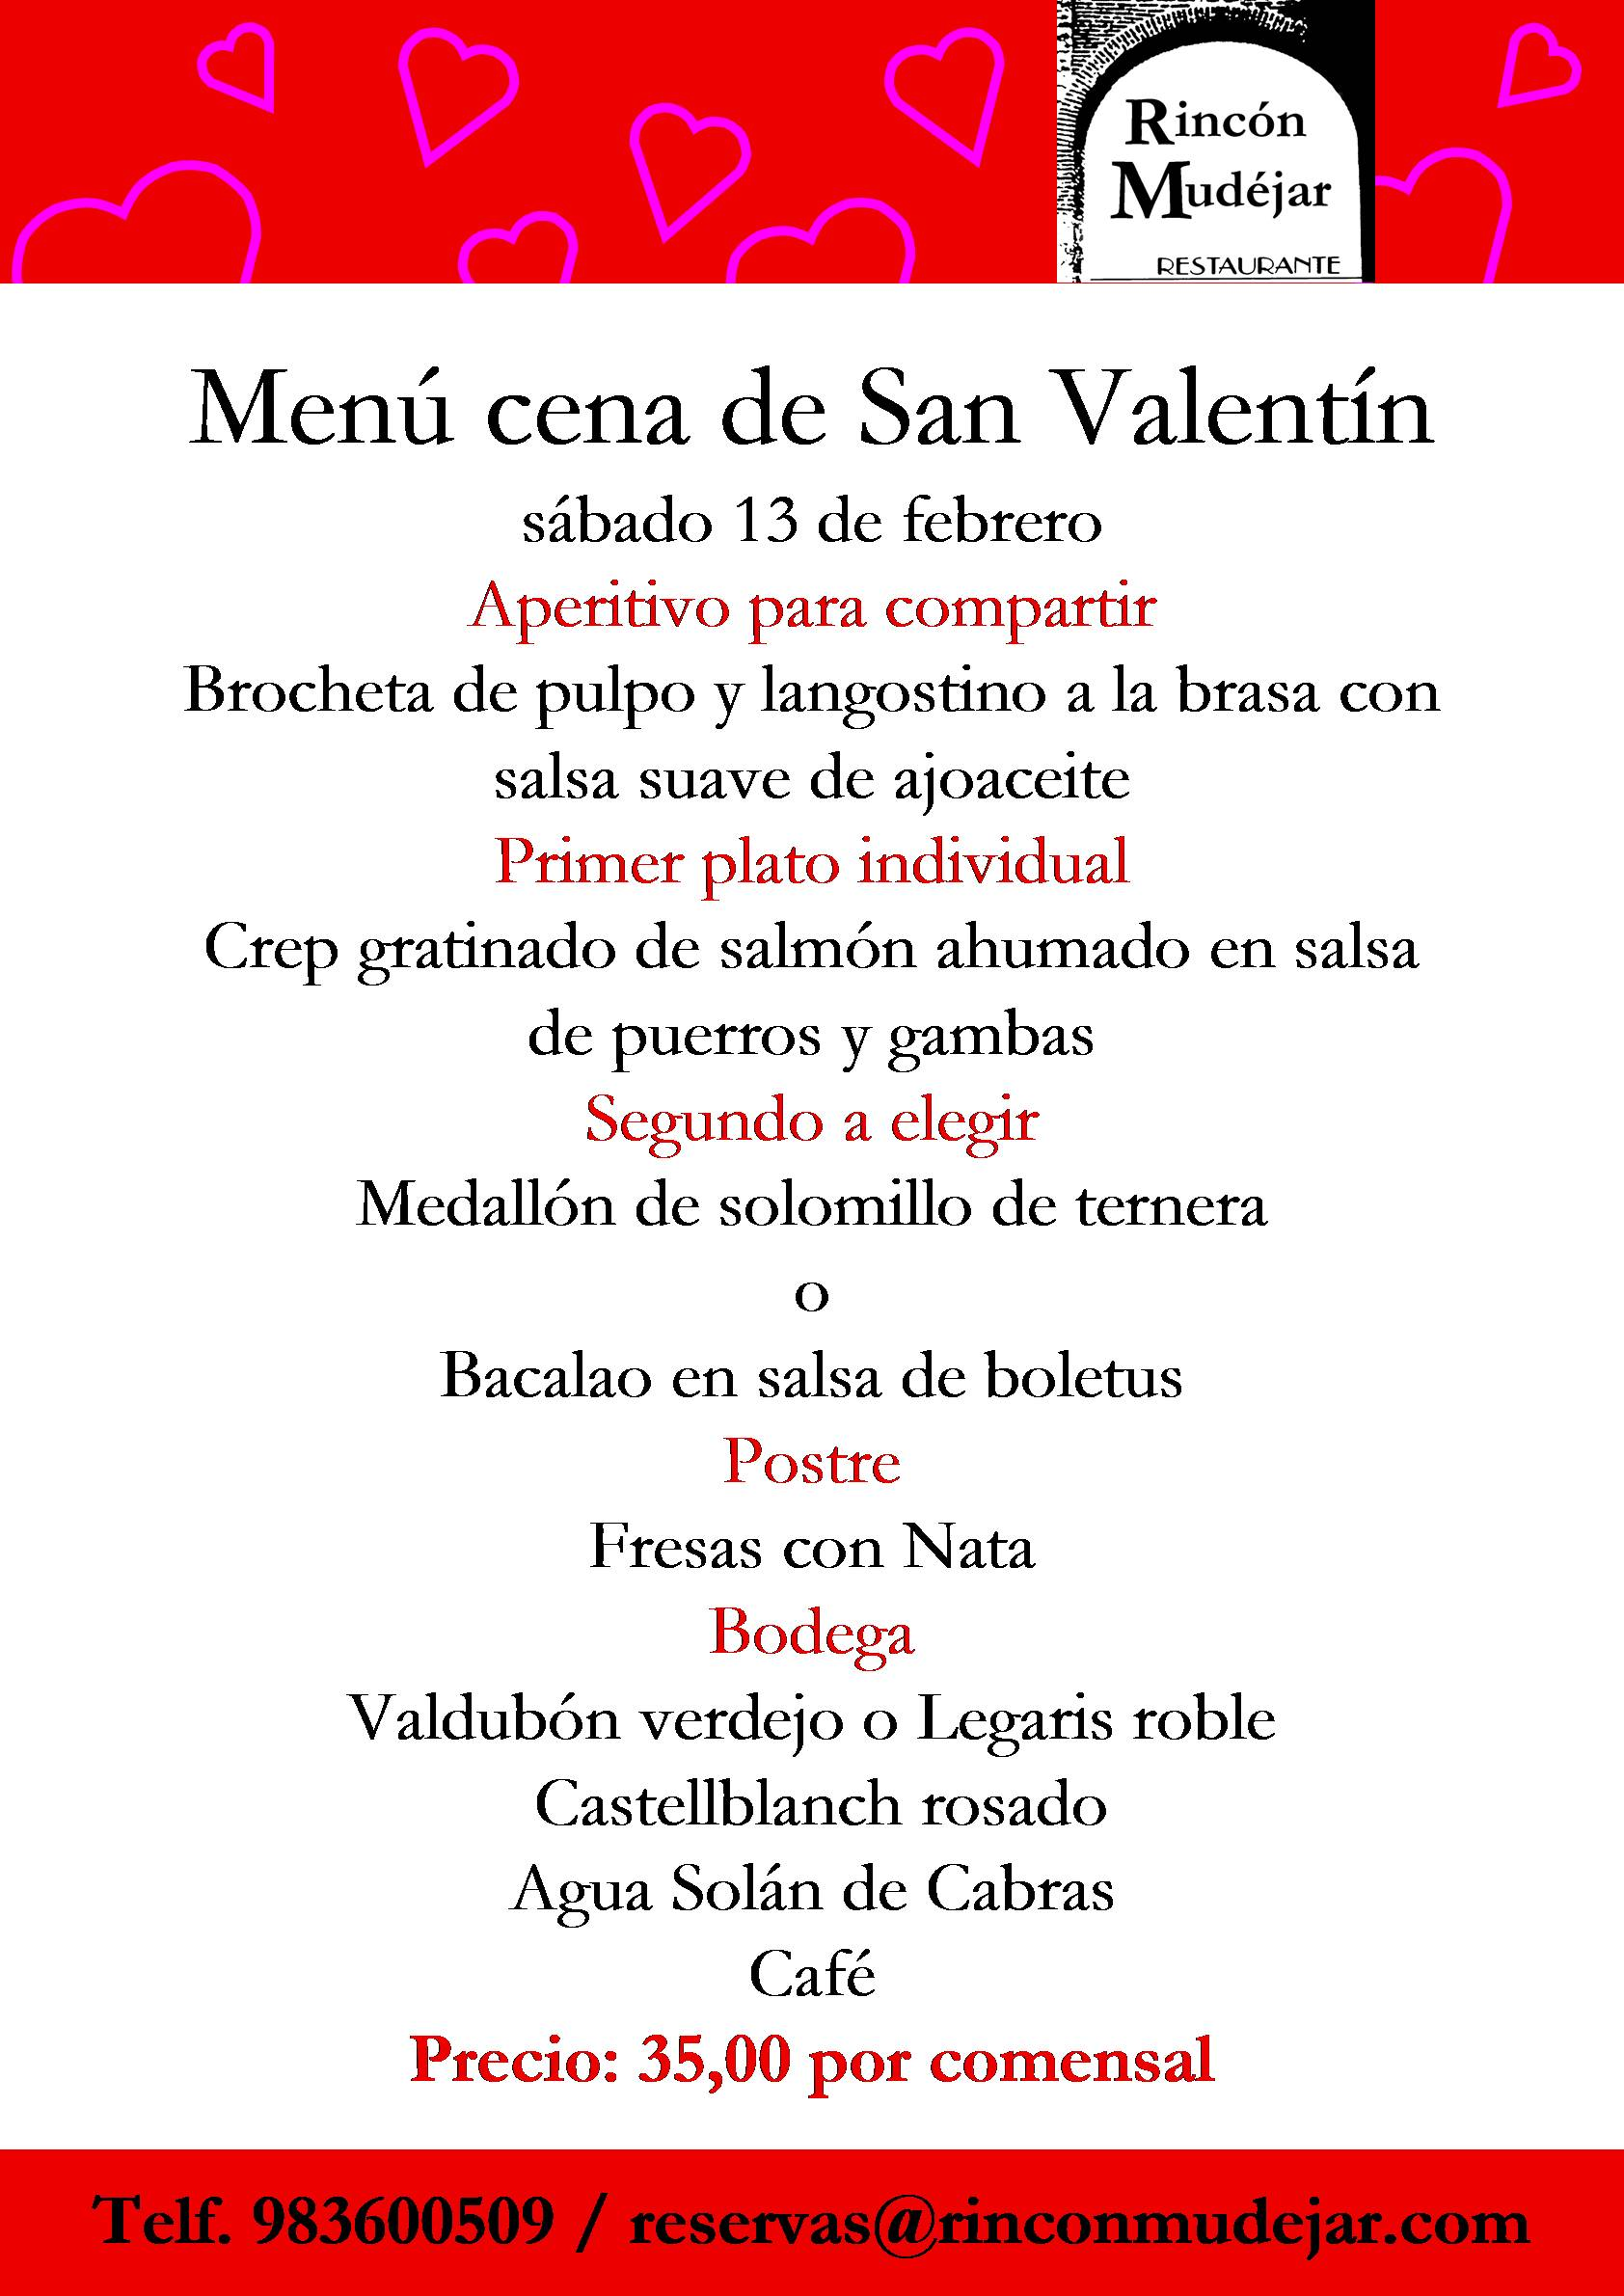 Menú cena de San Valentín 2016